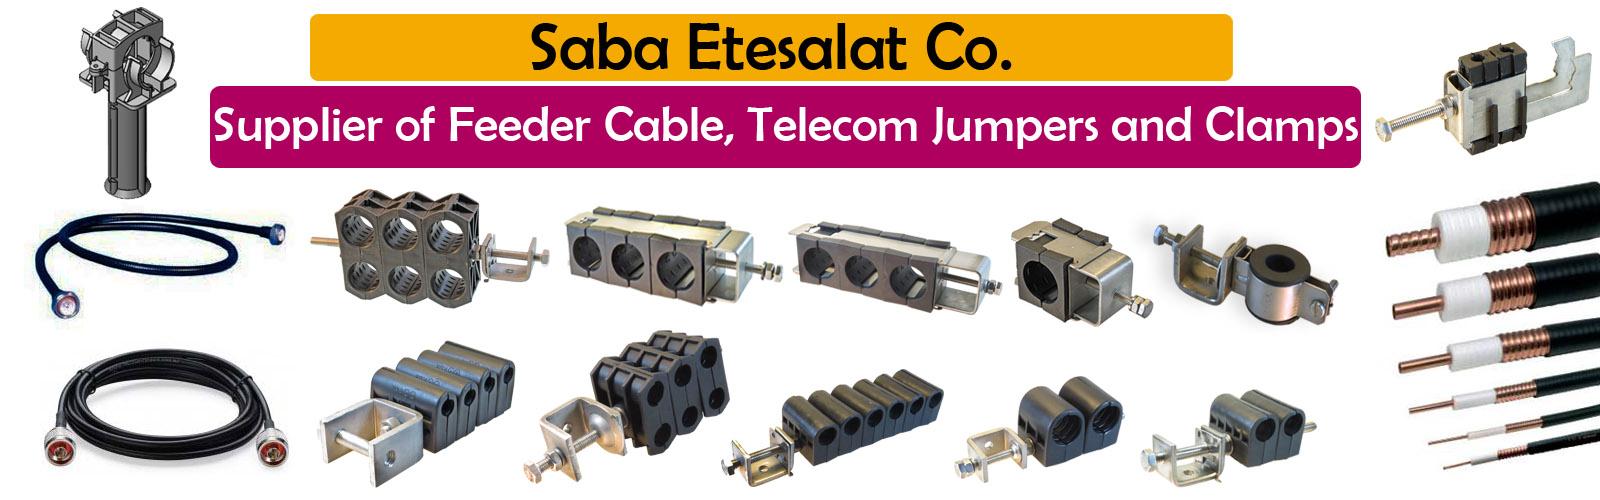 saba etesalat,feeder cable,telecom clamp,rf clamp